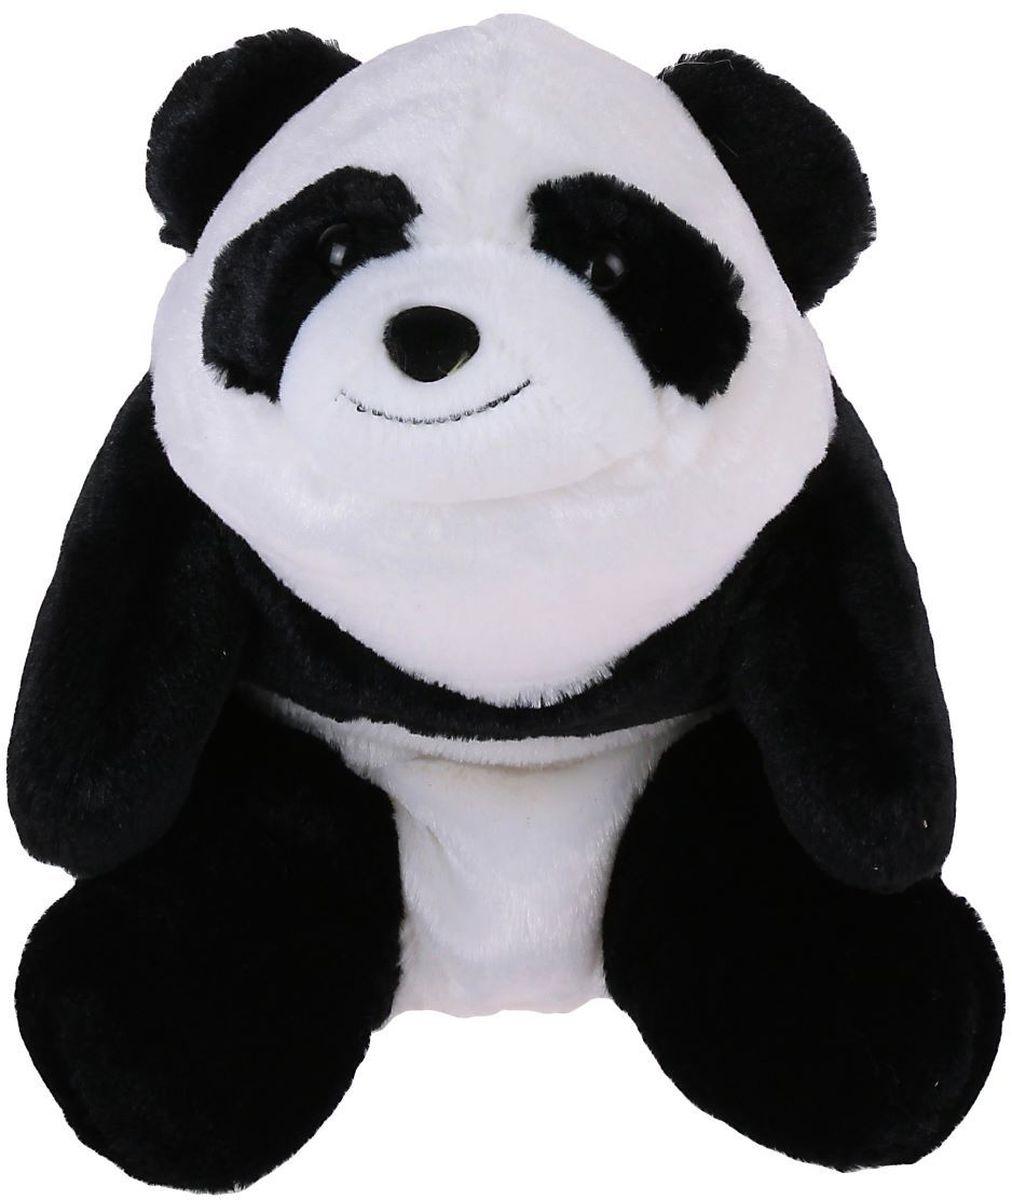 Gund Мягкая игрушка Панда Snuffles 22,5 см 2245539 gund мягкая игрушка velvetino с зеленым шарфом 30 5 см